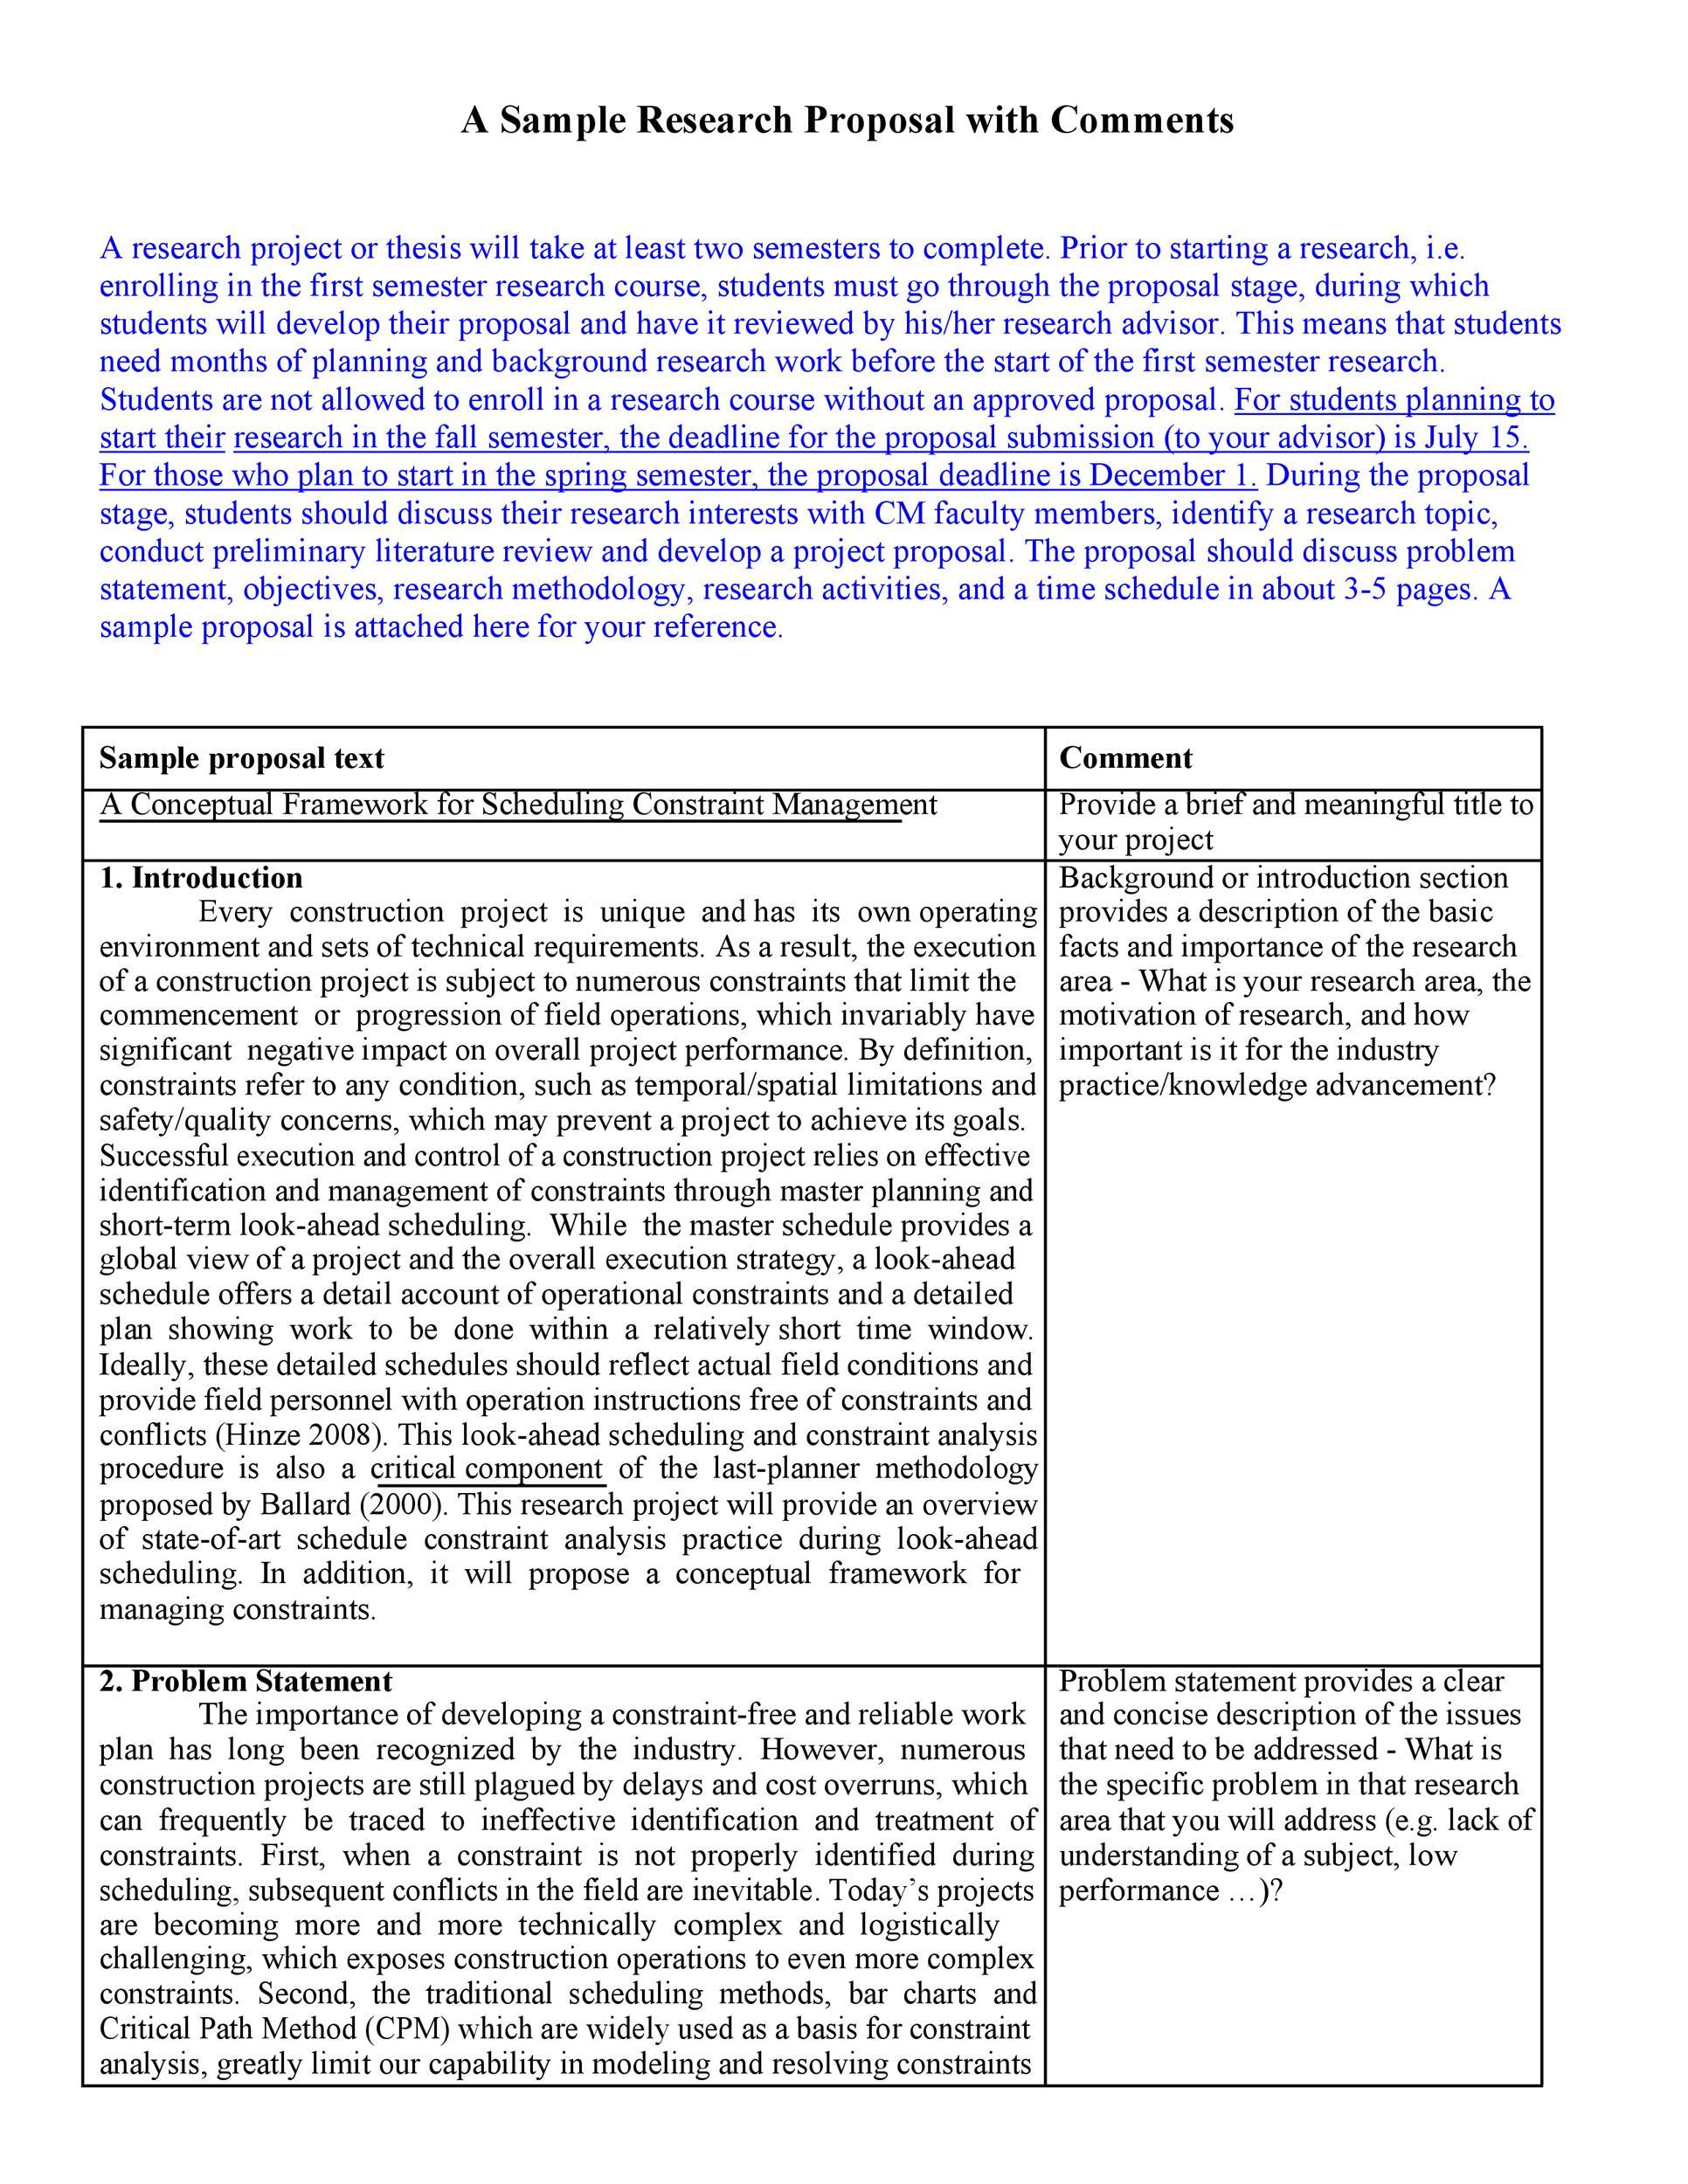 50 Printable Problem Statement Templates (MS Word) ᐅ Template Lab